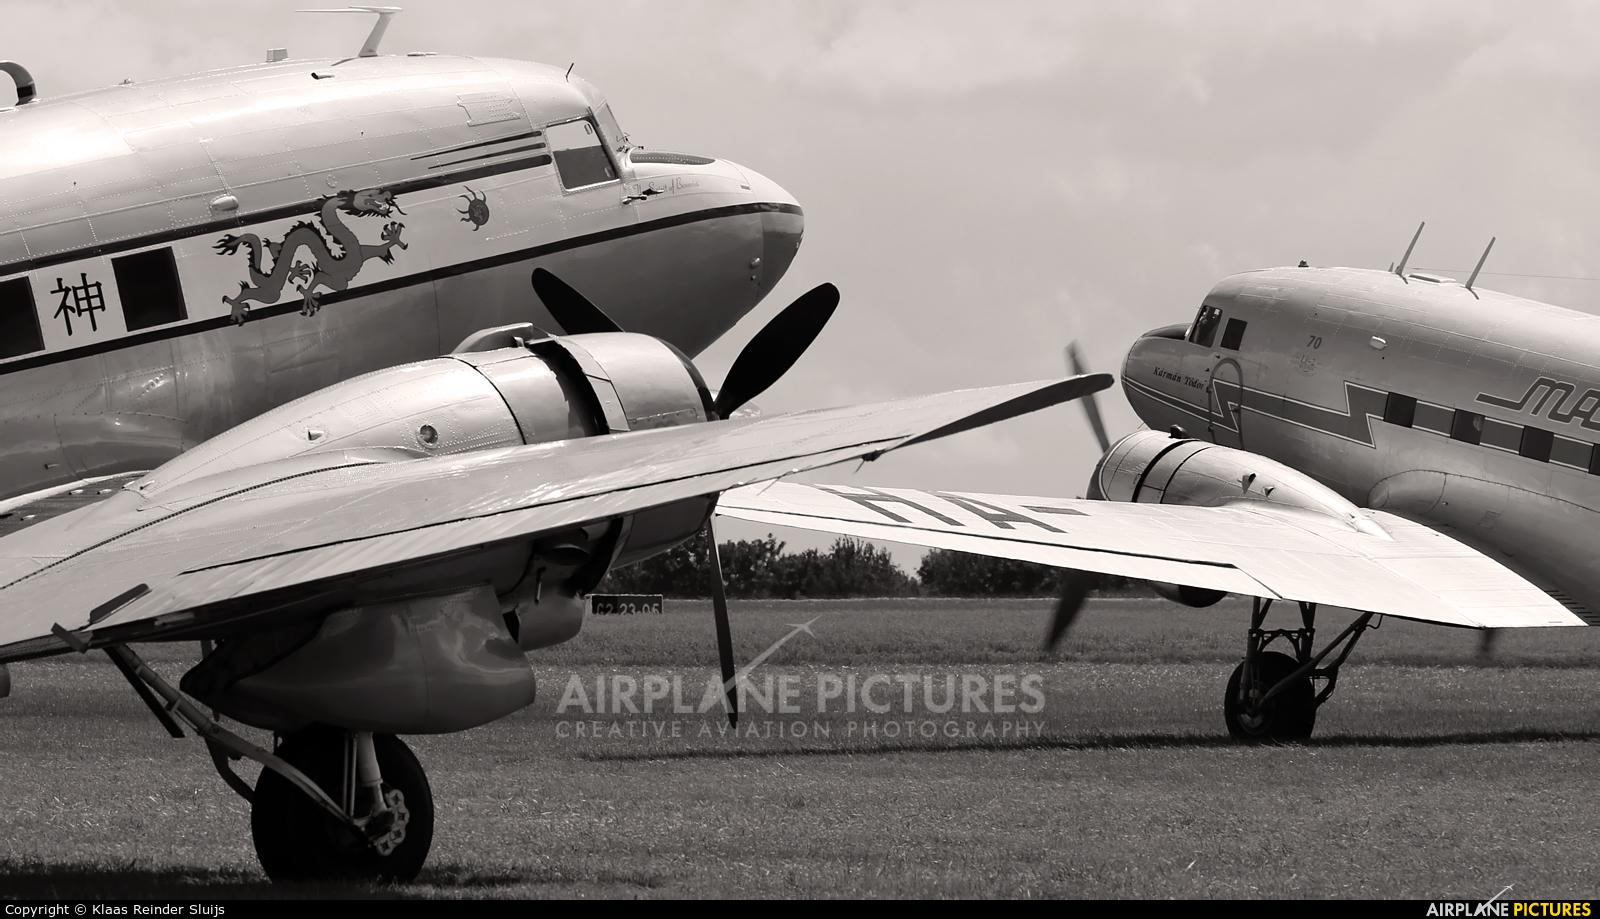 Benovia N8336C aircraft at Caen-Carpiquet